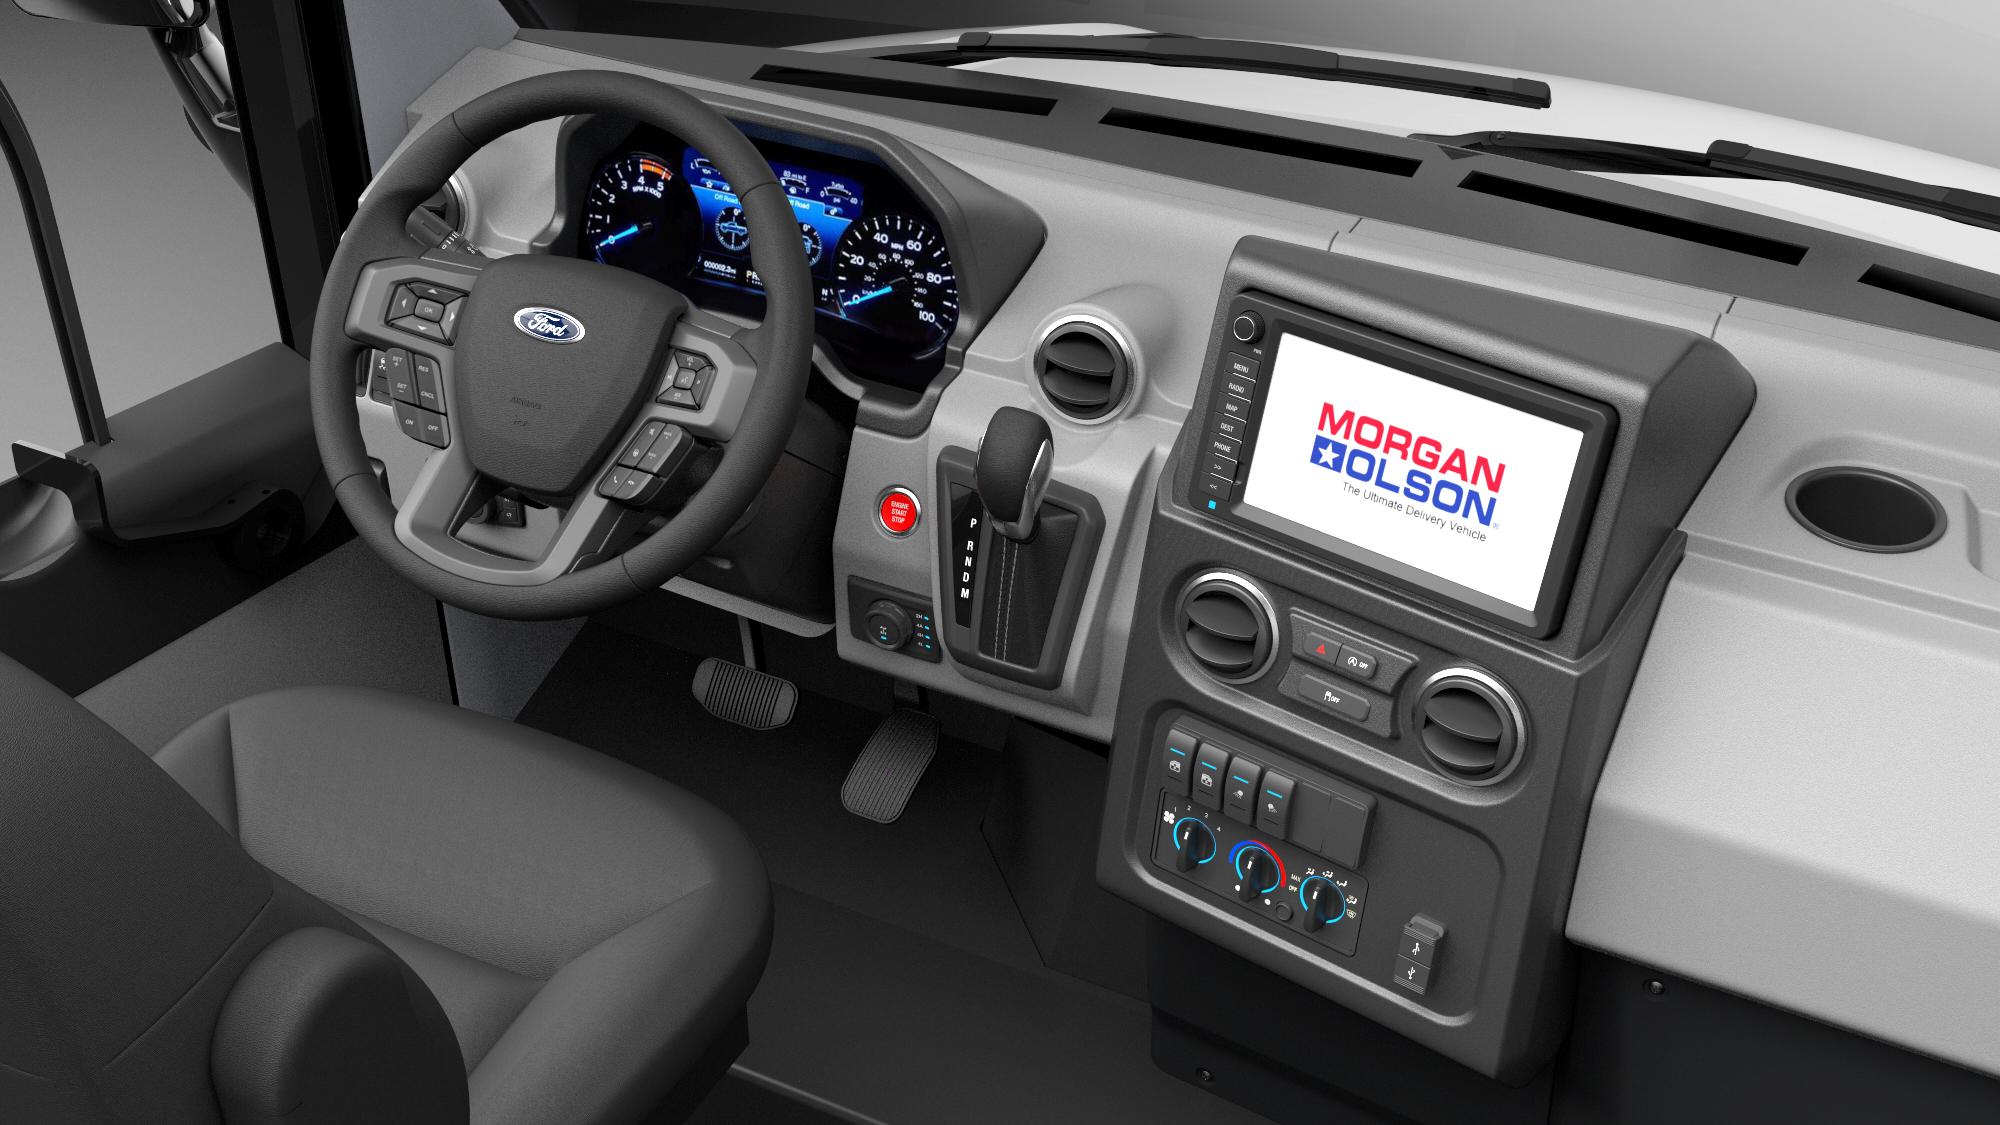 Morgan Olson Storm Interior